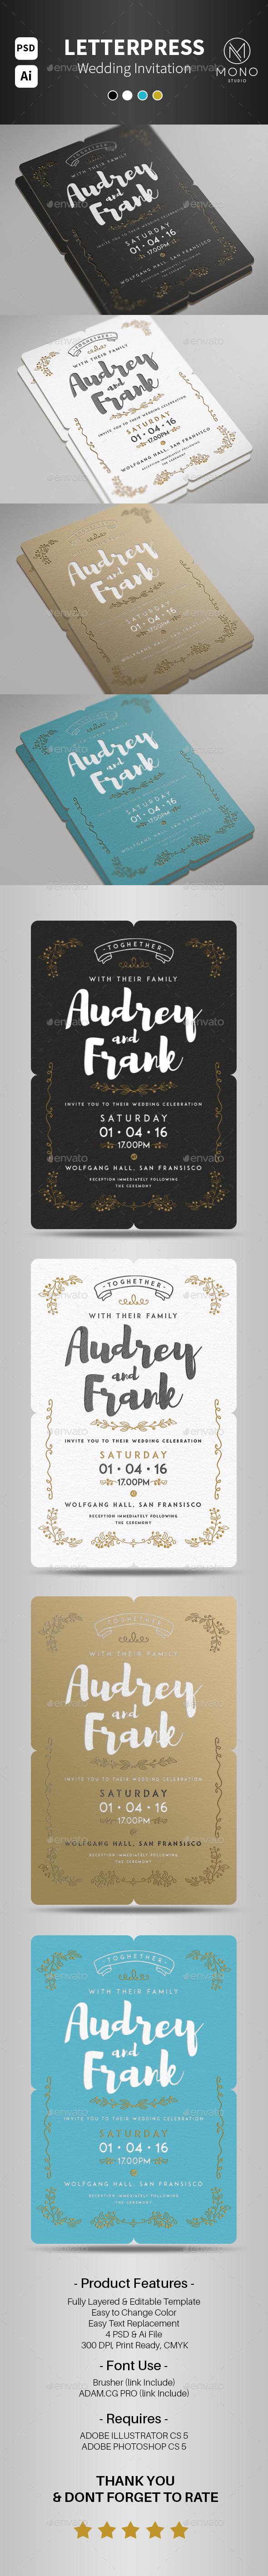 Letterpress Wedding Invitation Set 2 - Invitations Cards & Invites